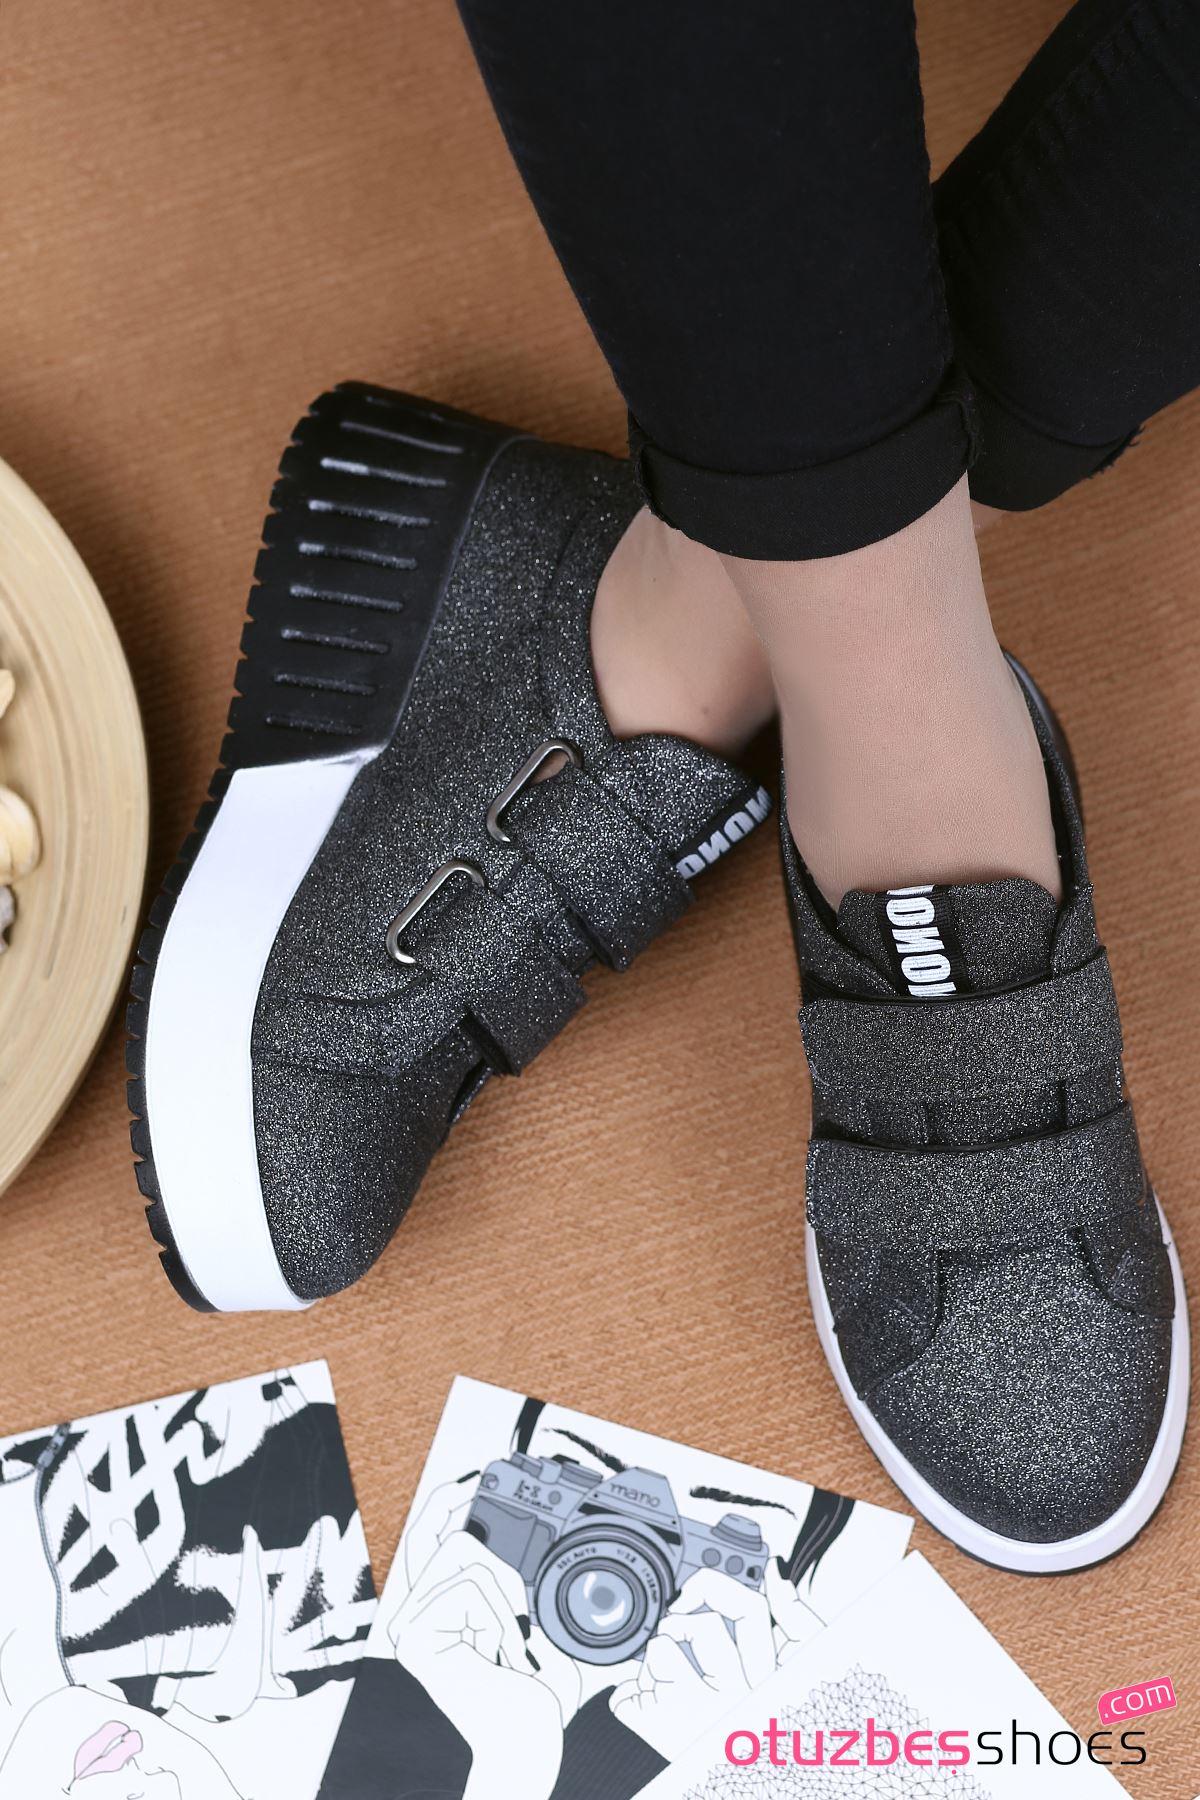 Mosso Simli Cırt Detay Spor Ayakkabı Platin